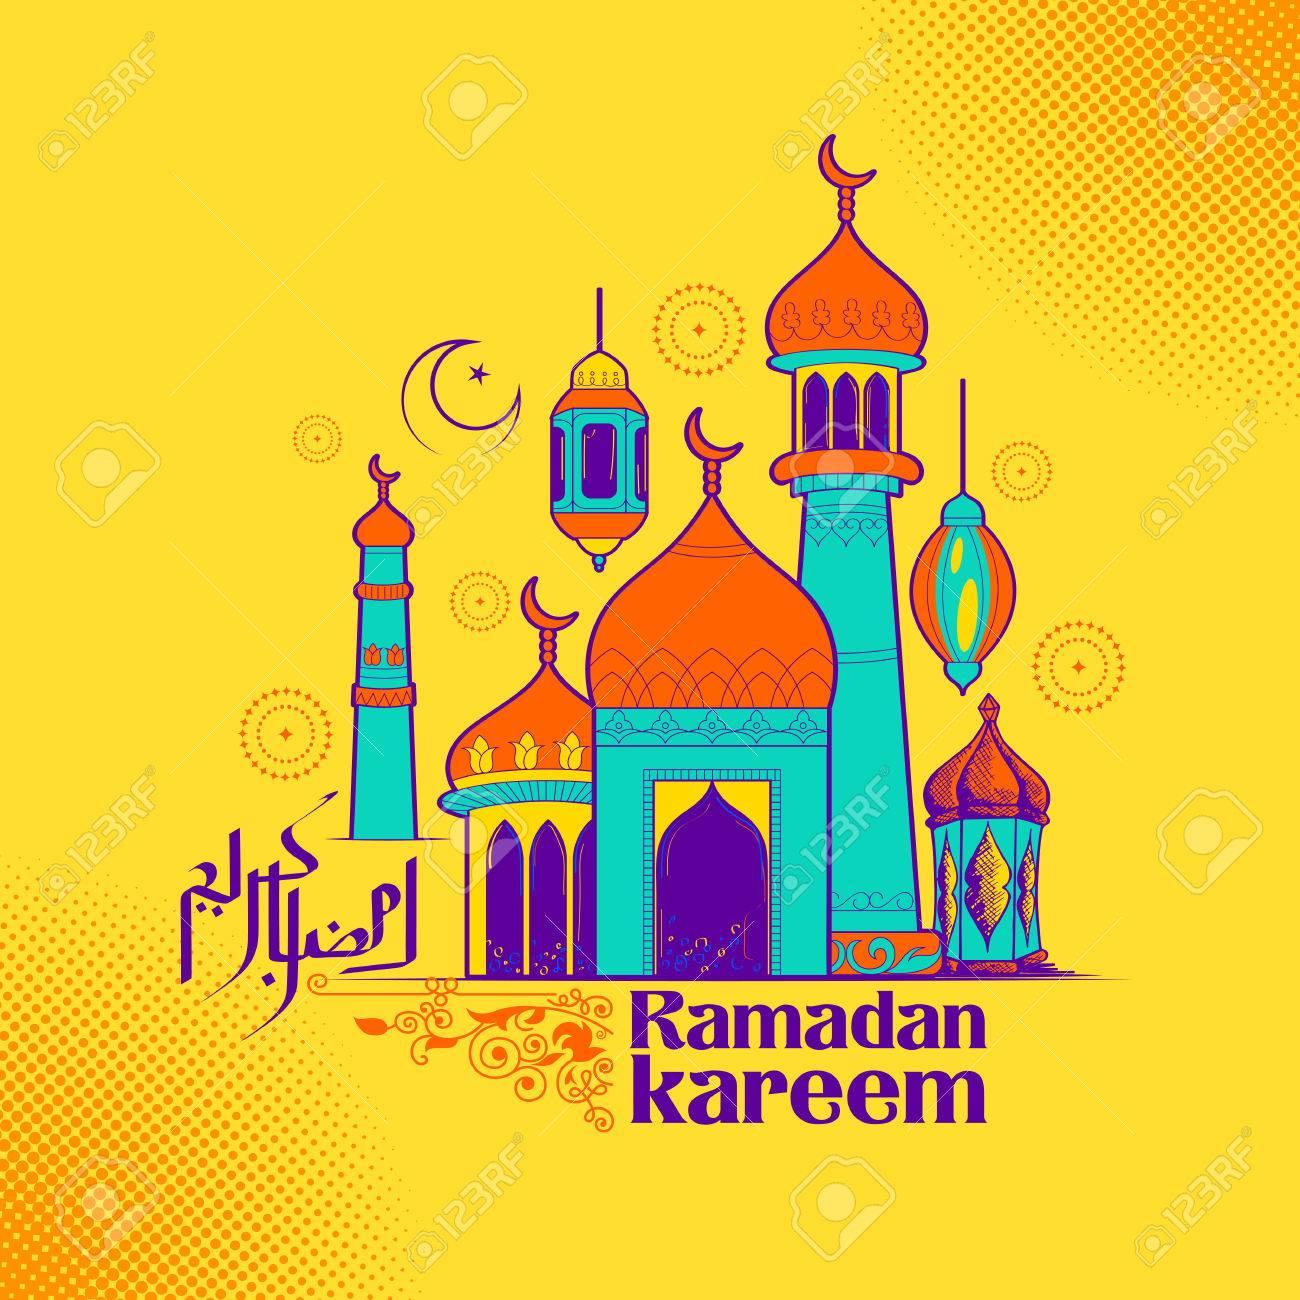 Ramadan Kareem Generous Ramadan Greetings In Arabic Freehand Stock